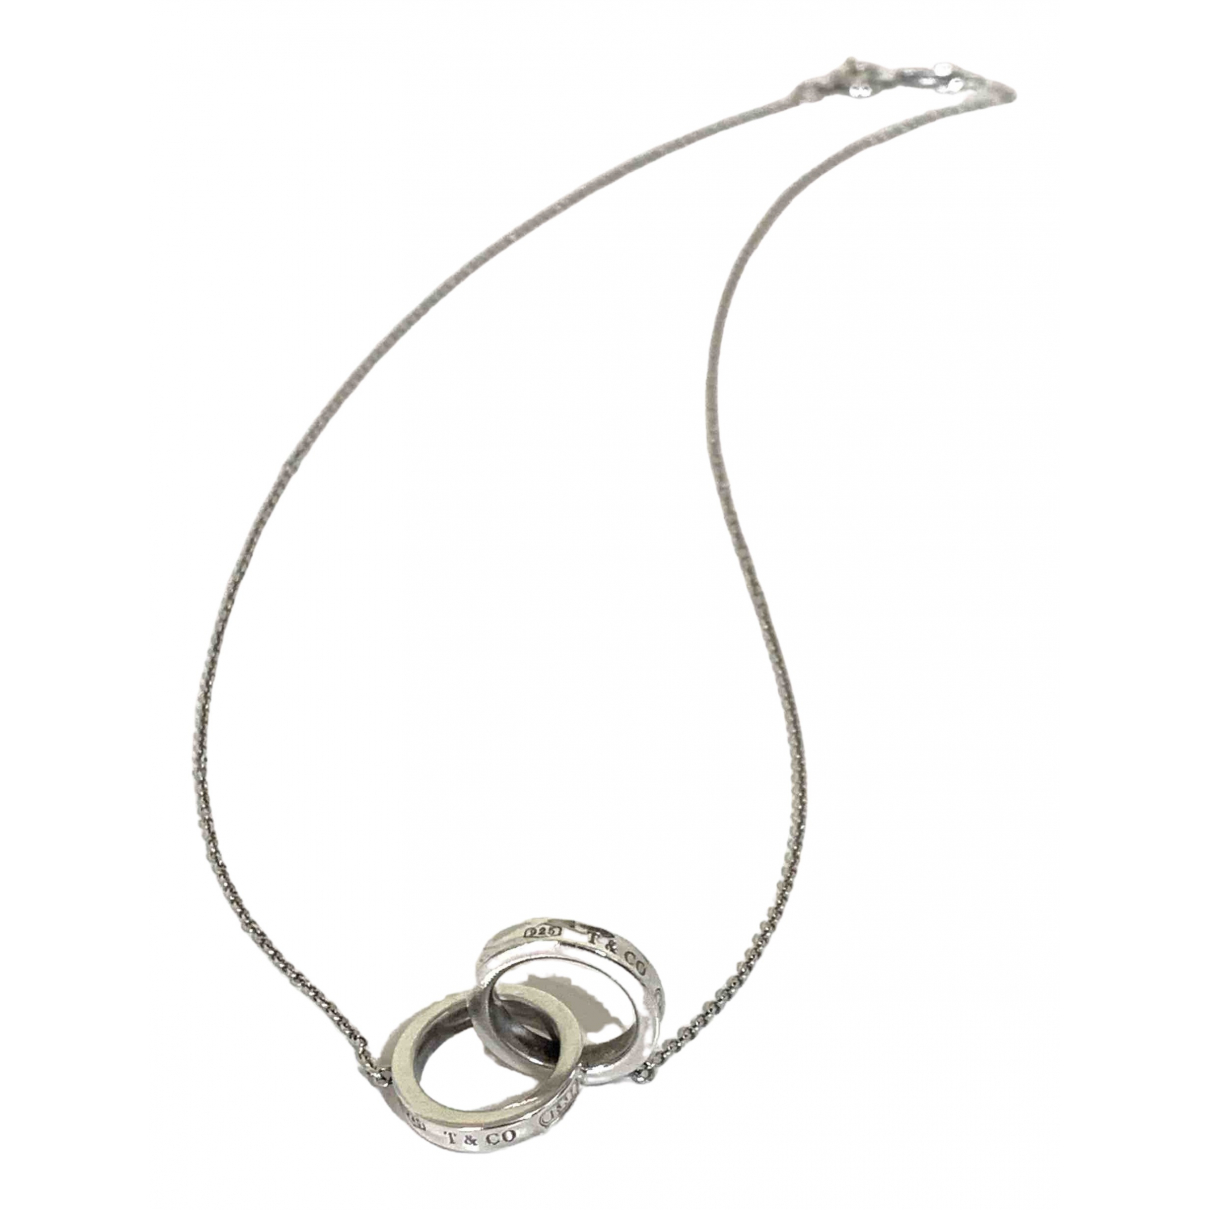 Collar Tiffany 1837 de Plata Tiffany & Co